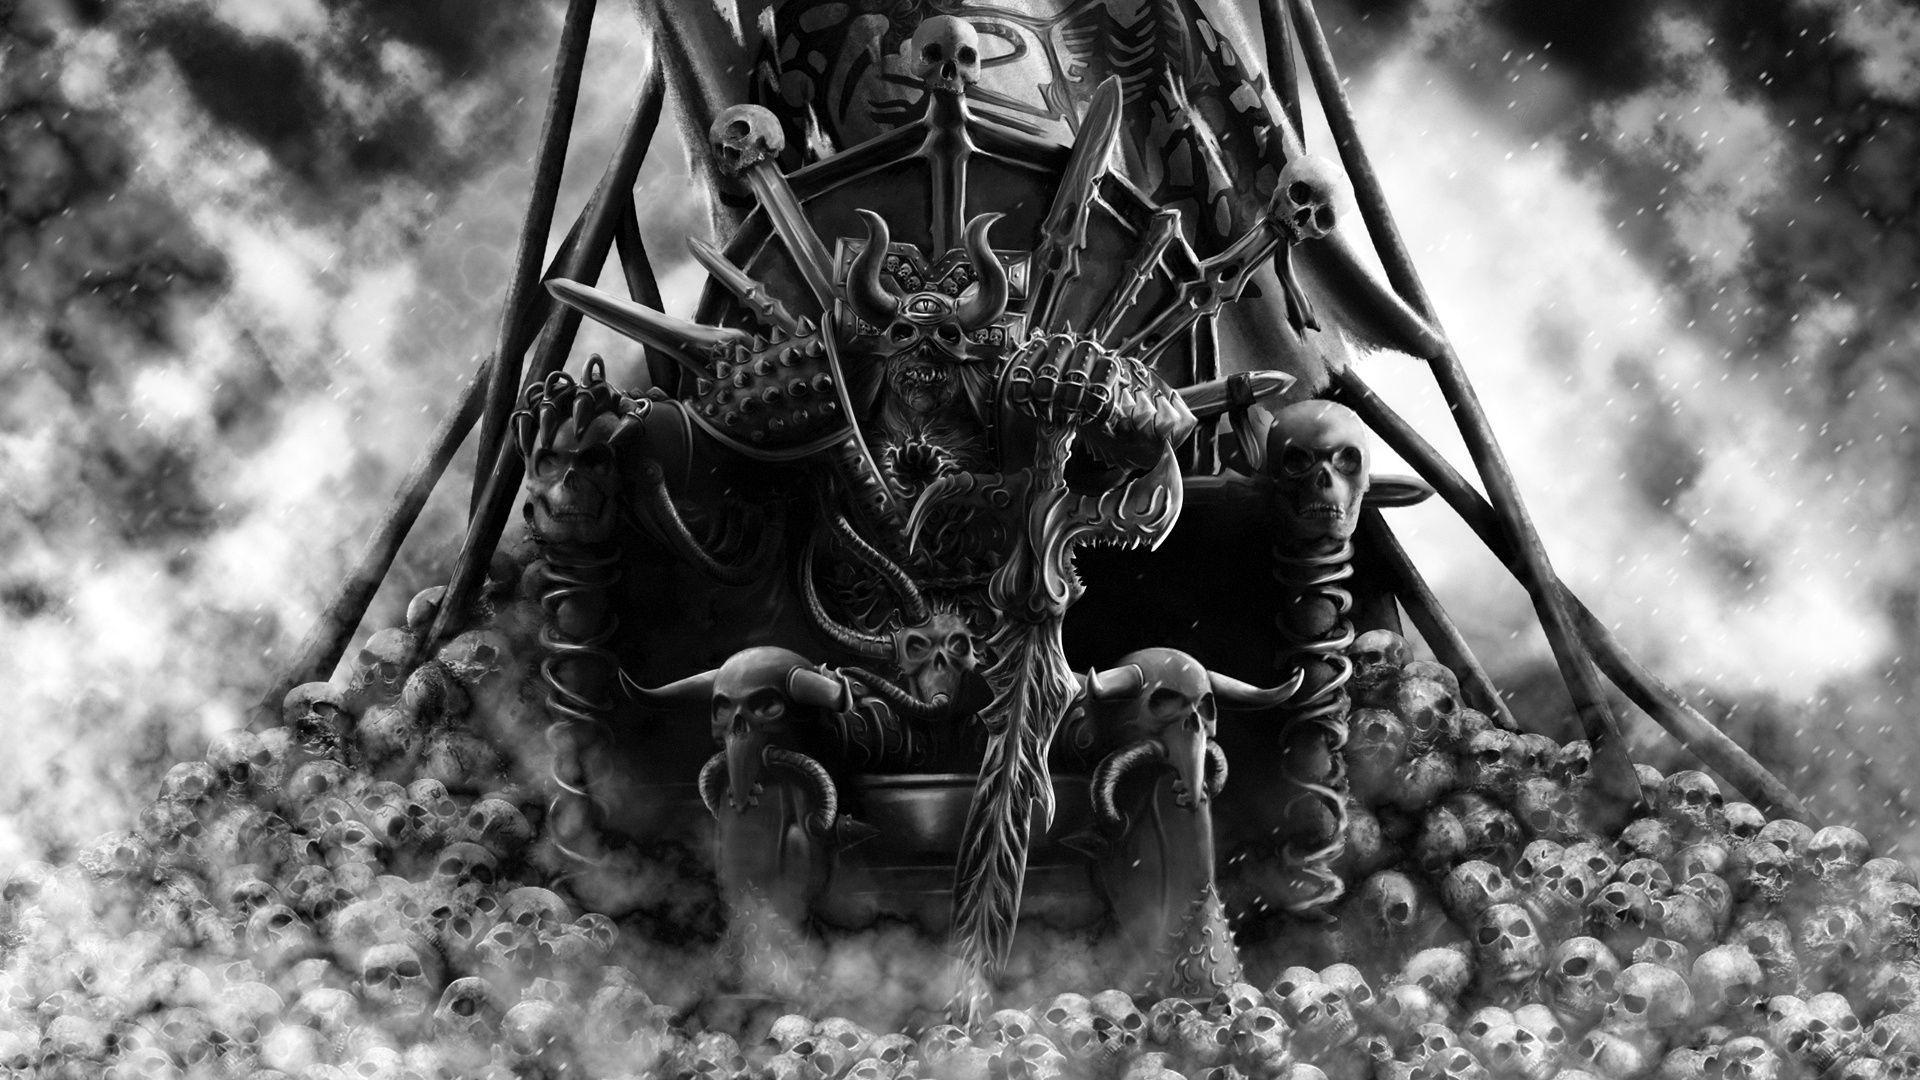 Demon king wallpapers wallpaper cave - King wallpaper ...